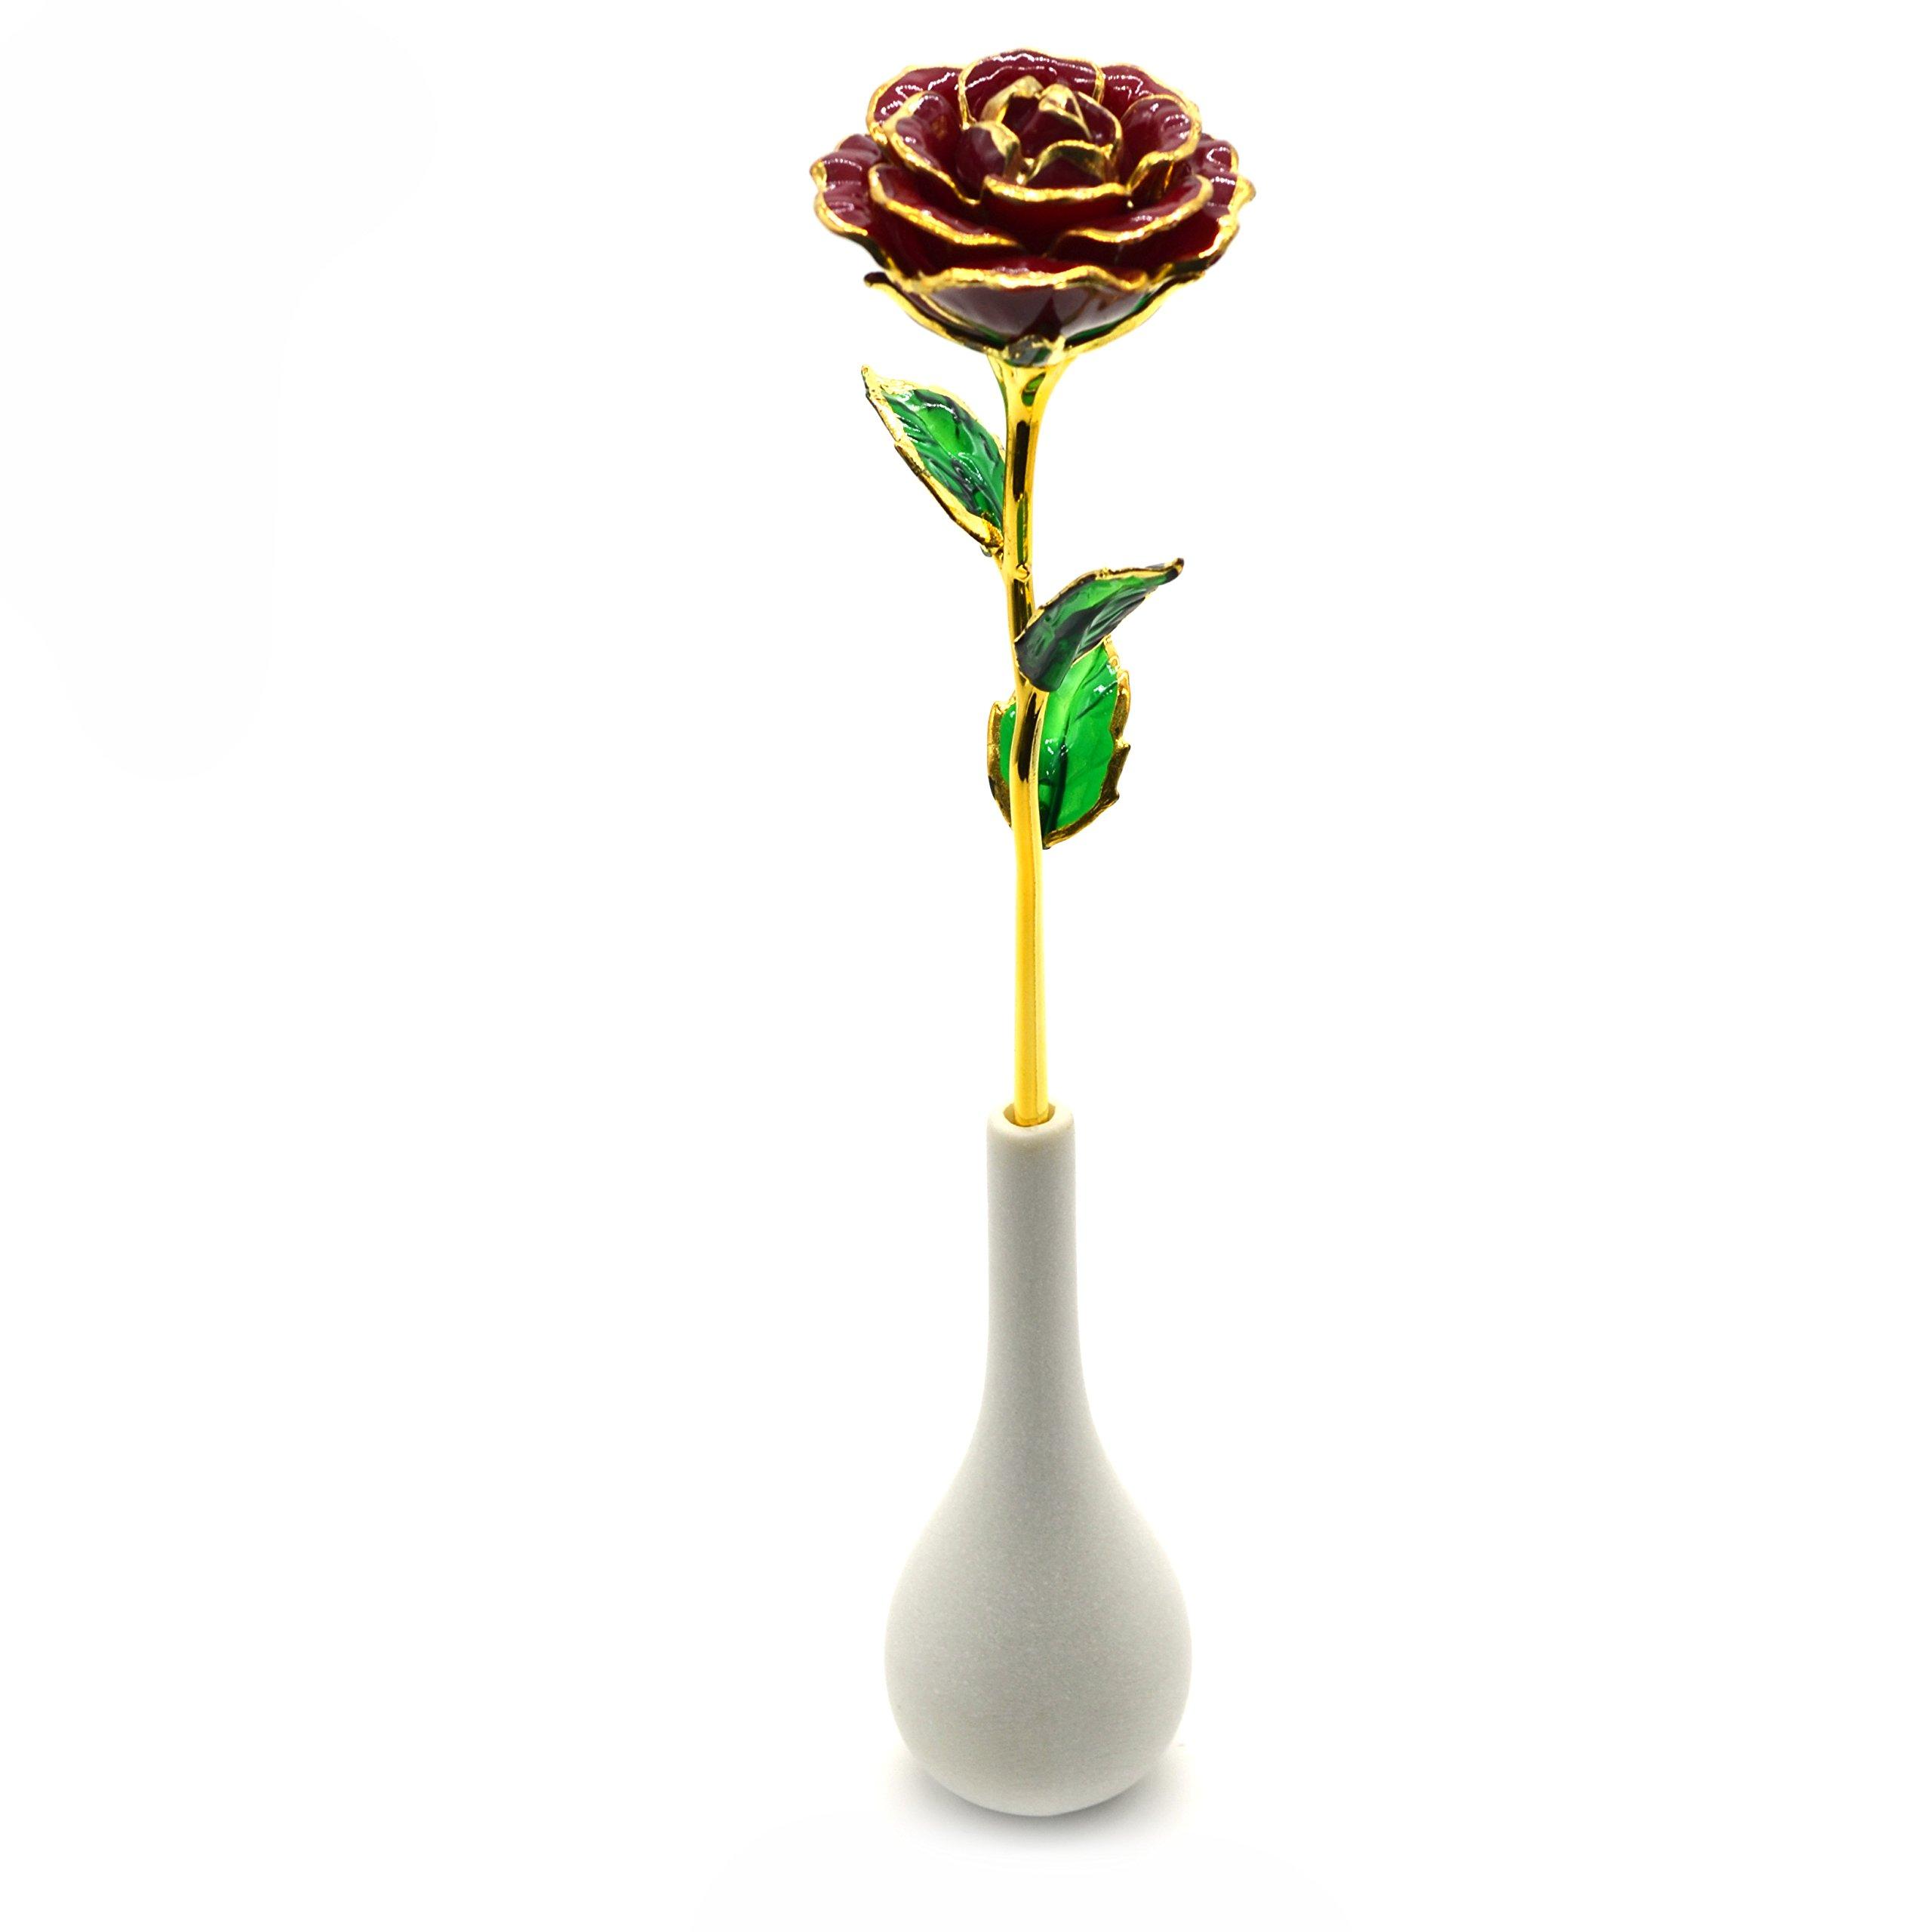 Omonic long stem dipped 24k gold trim valentines rose with vase in omonic long stem dipped 24k gold trim valentines rose with vase in gift boxvale reviewsmspy